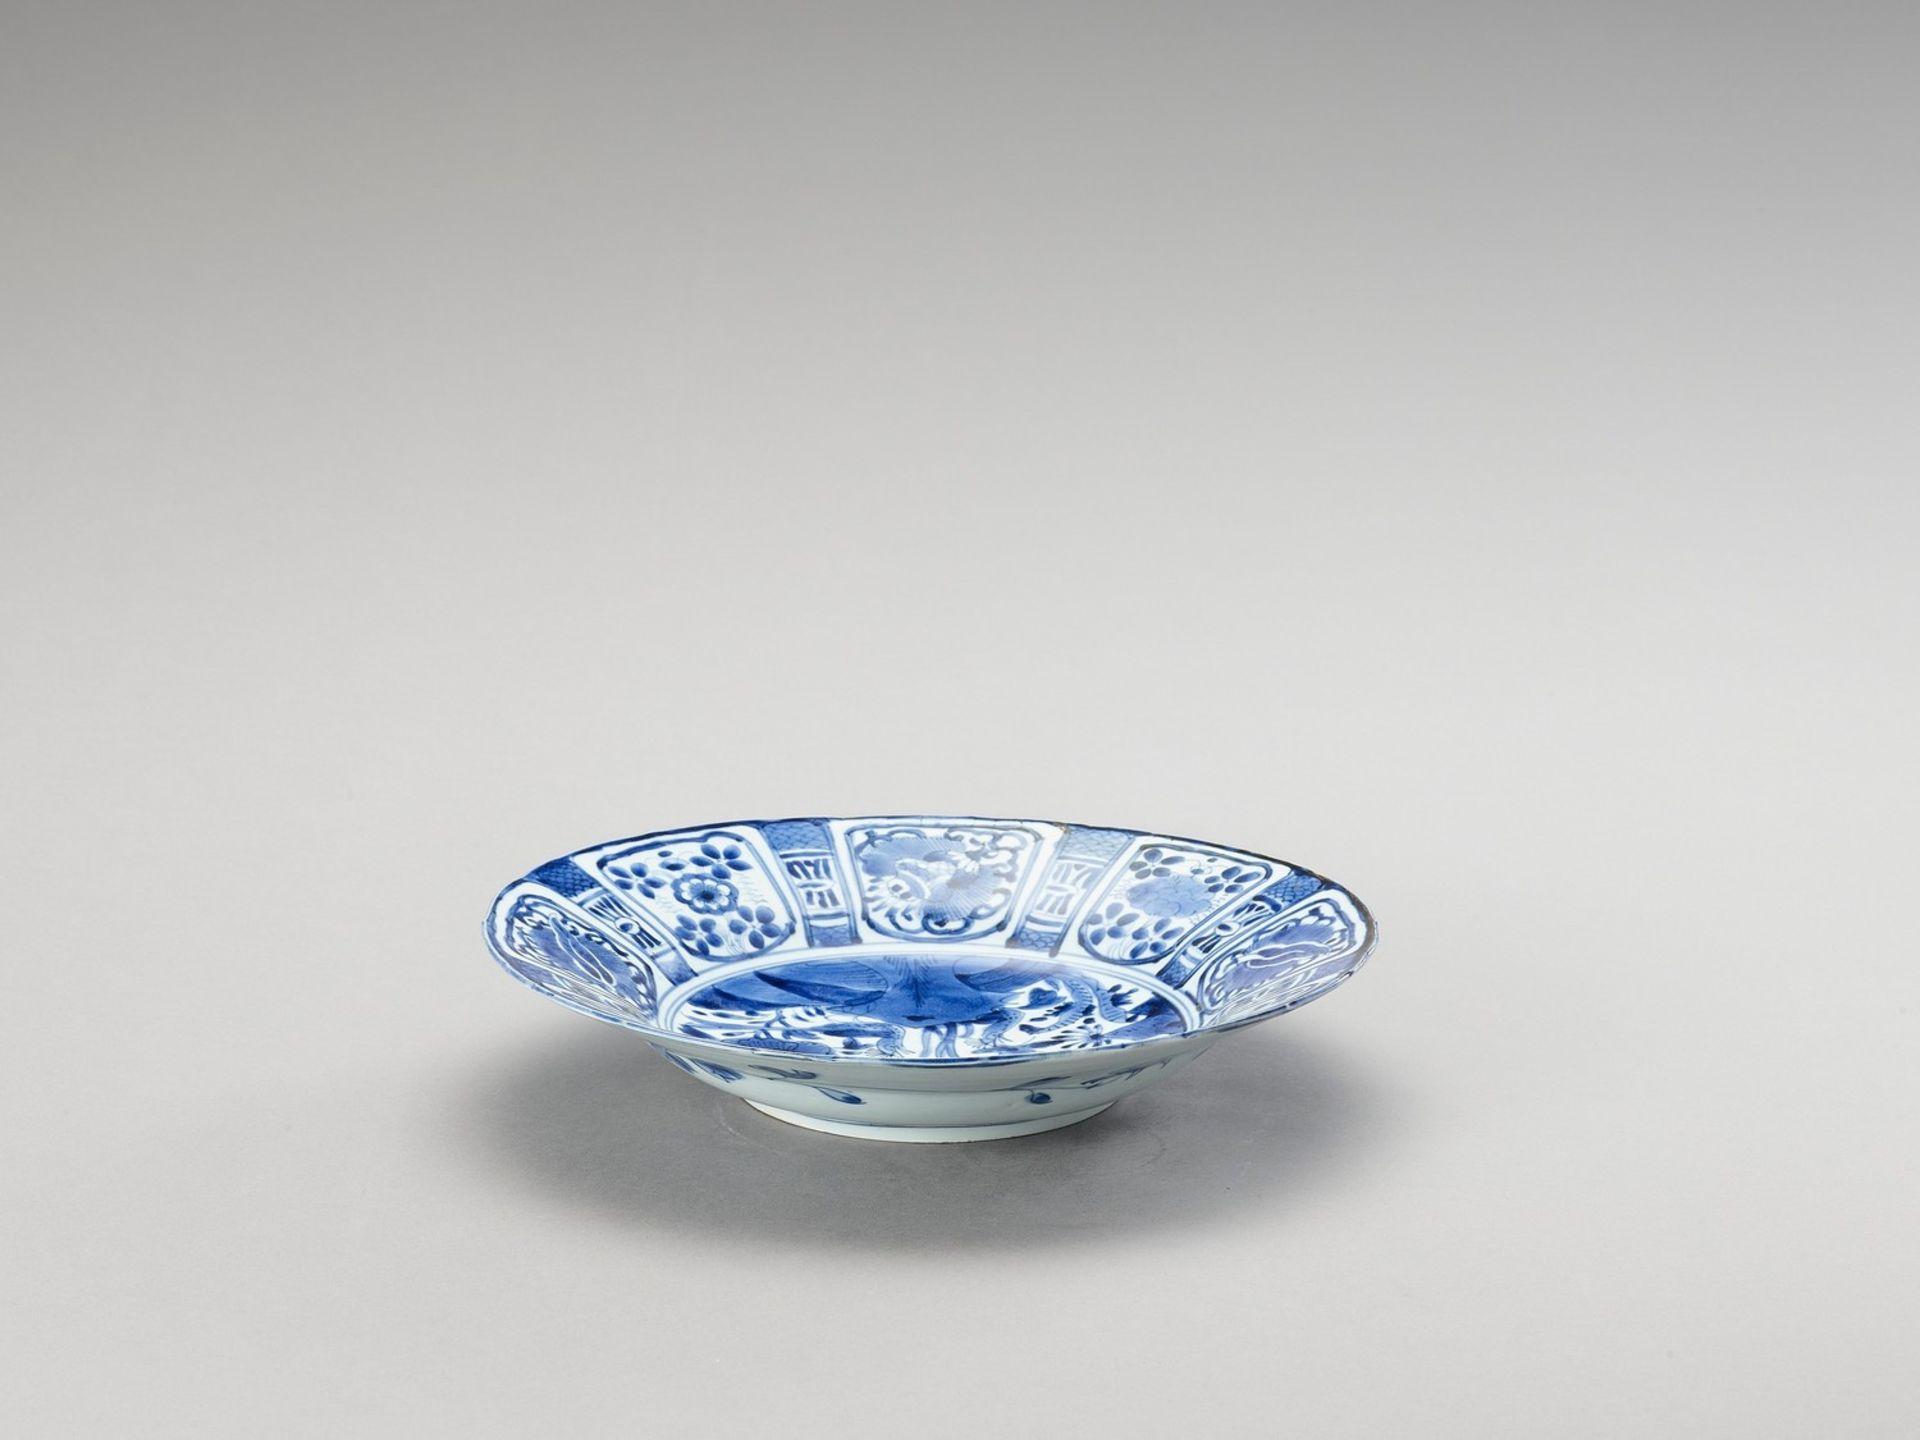 A BLUE AND WHITE PORCELAIN DISH - Bild 4 aus 4